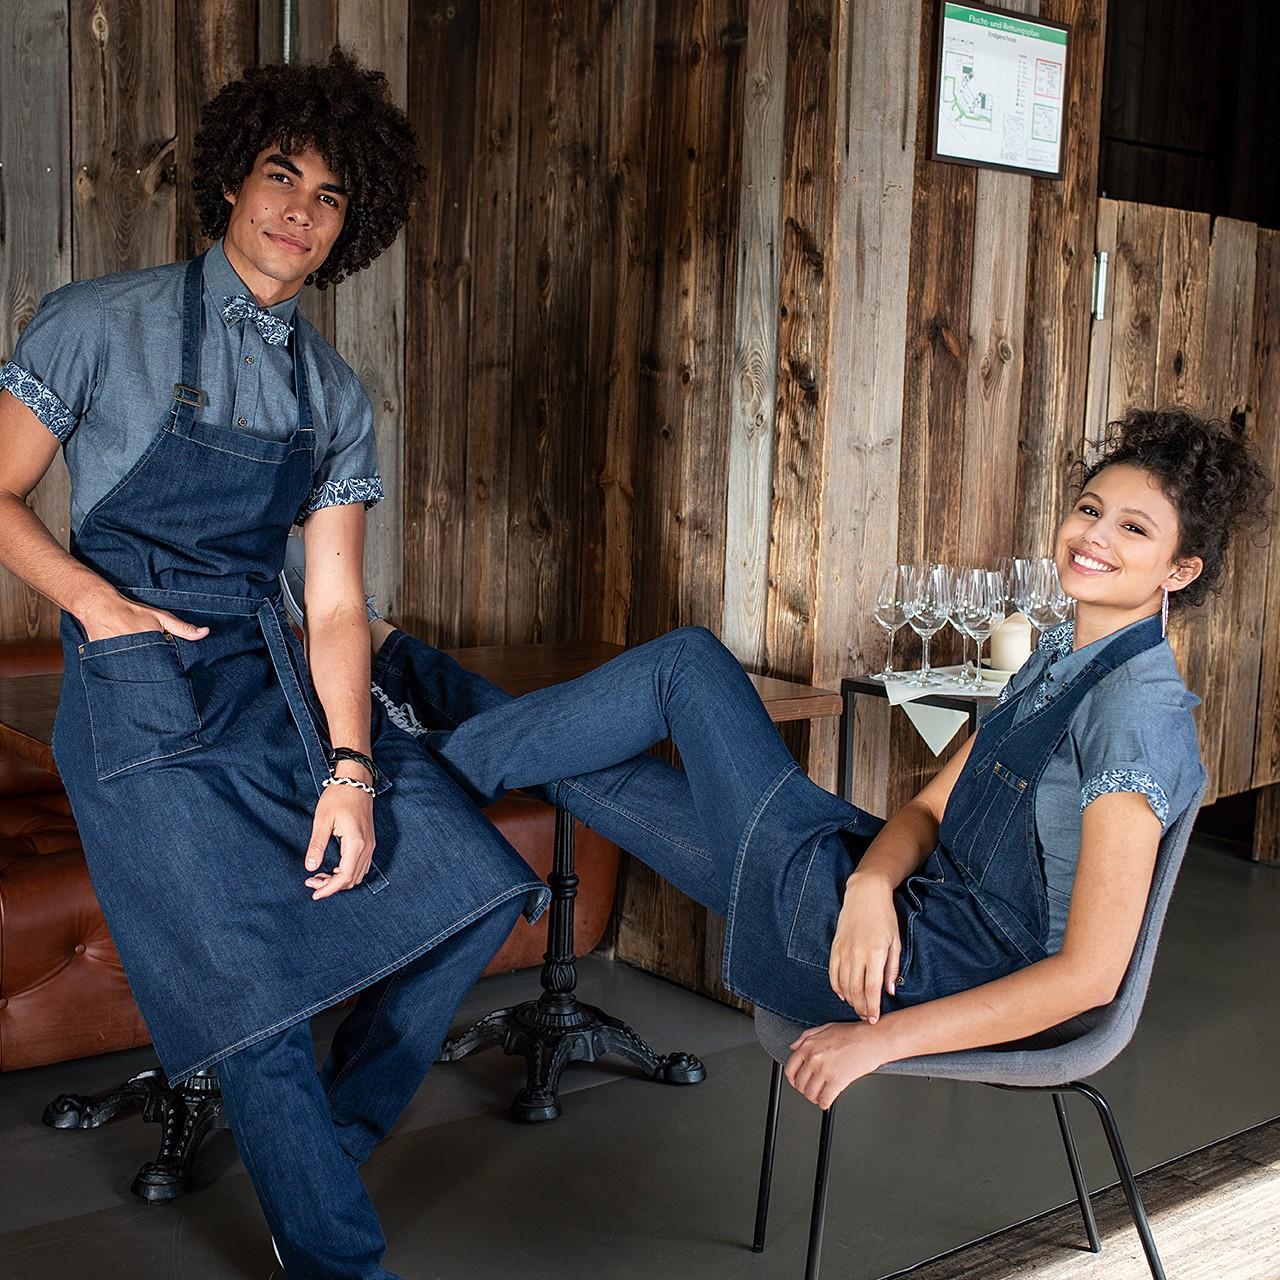 Premium Jeans Latzschürze Greiff® | bedrucken, besticken, bedrucken lassen, besticken lassen, mit Logo |